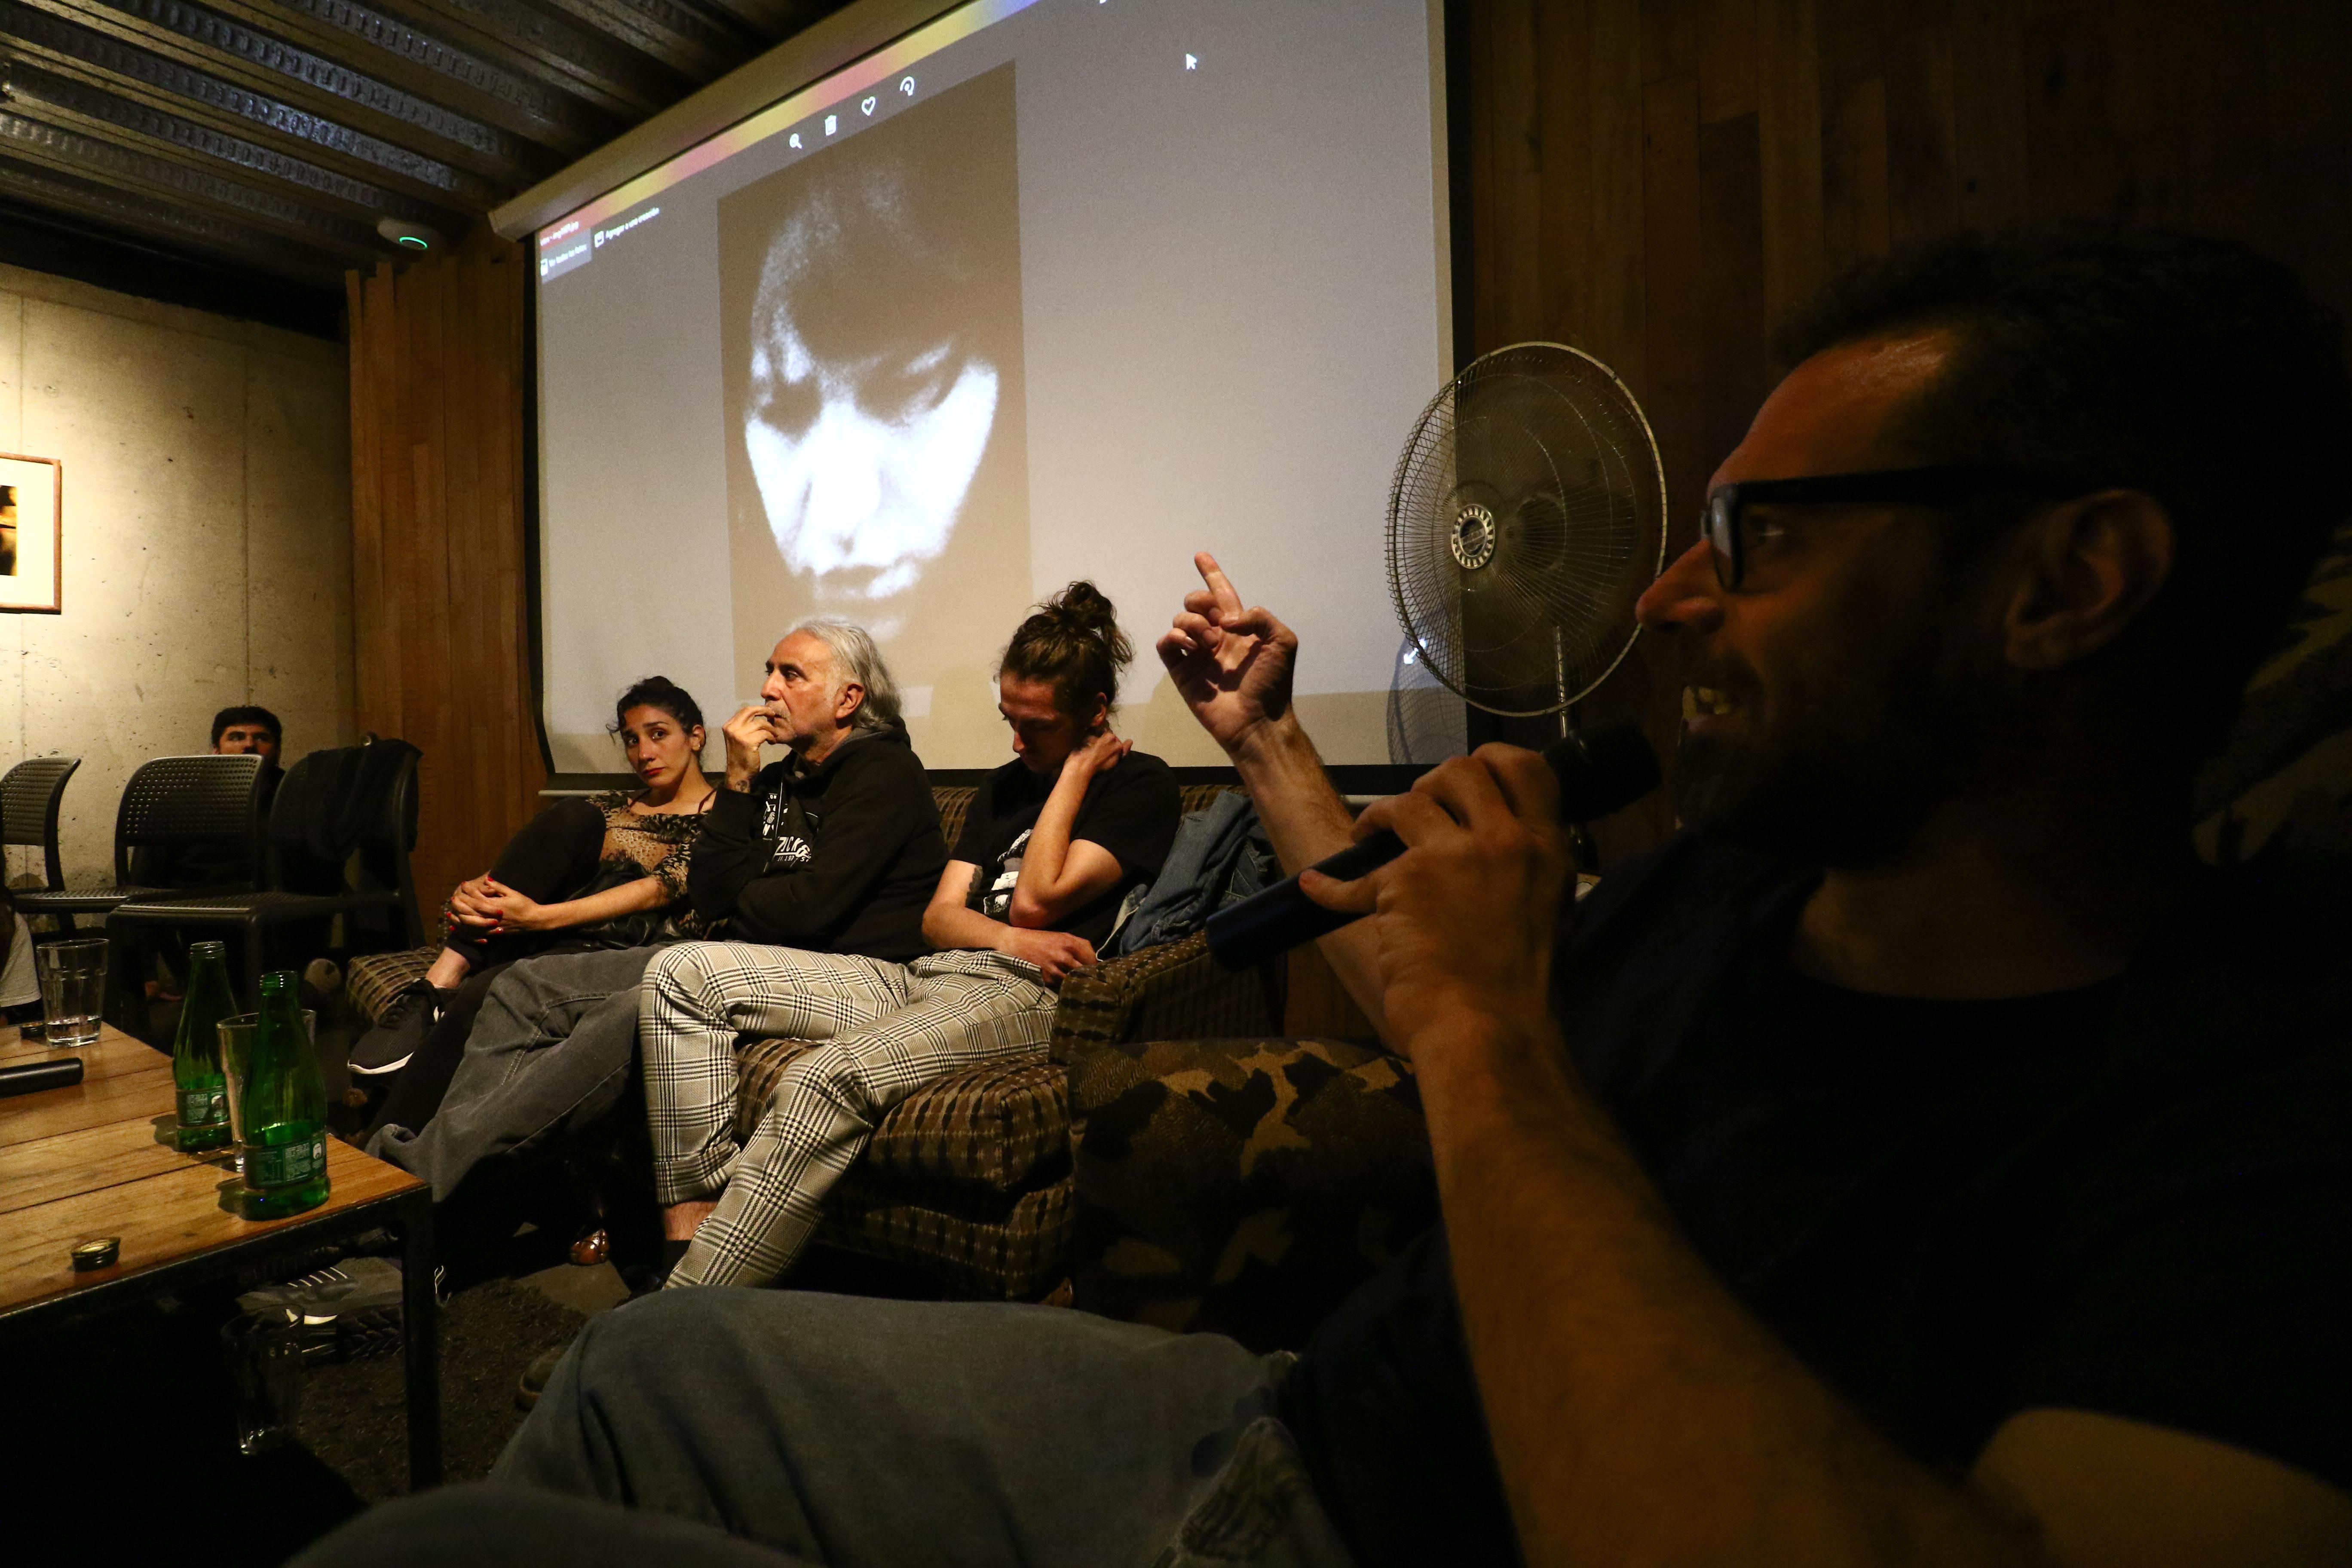 Primera sesion dialogos fotograficos © Eduardo Vargas /Fifv.